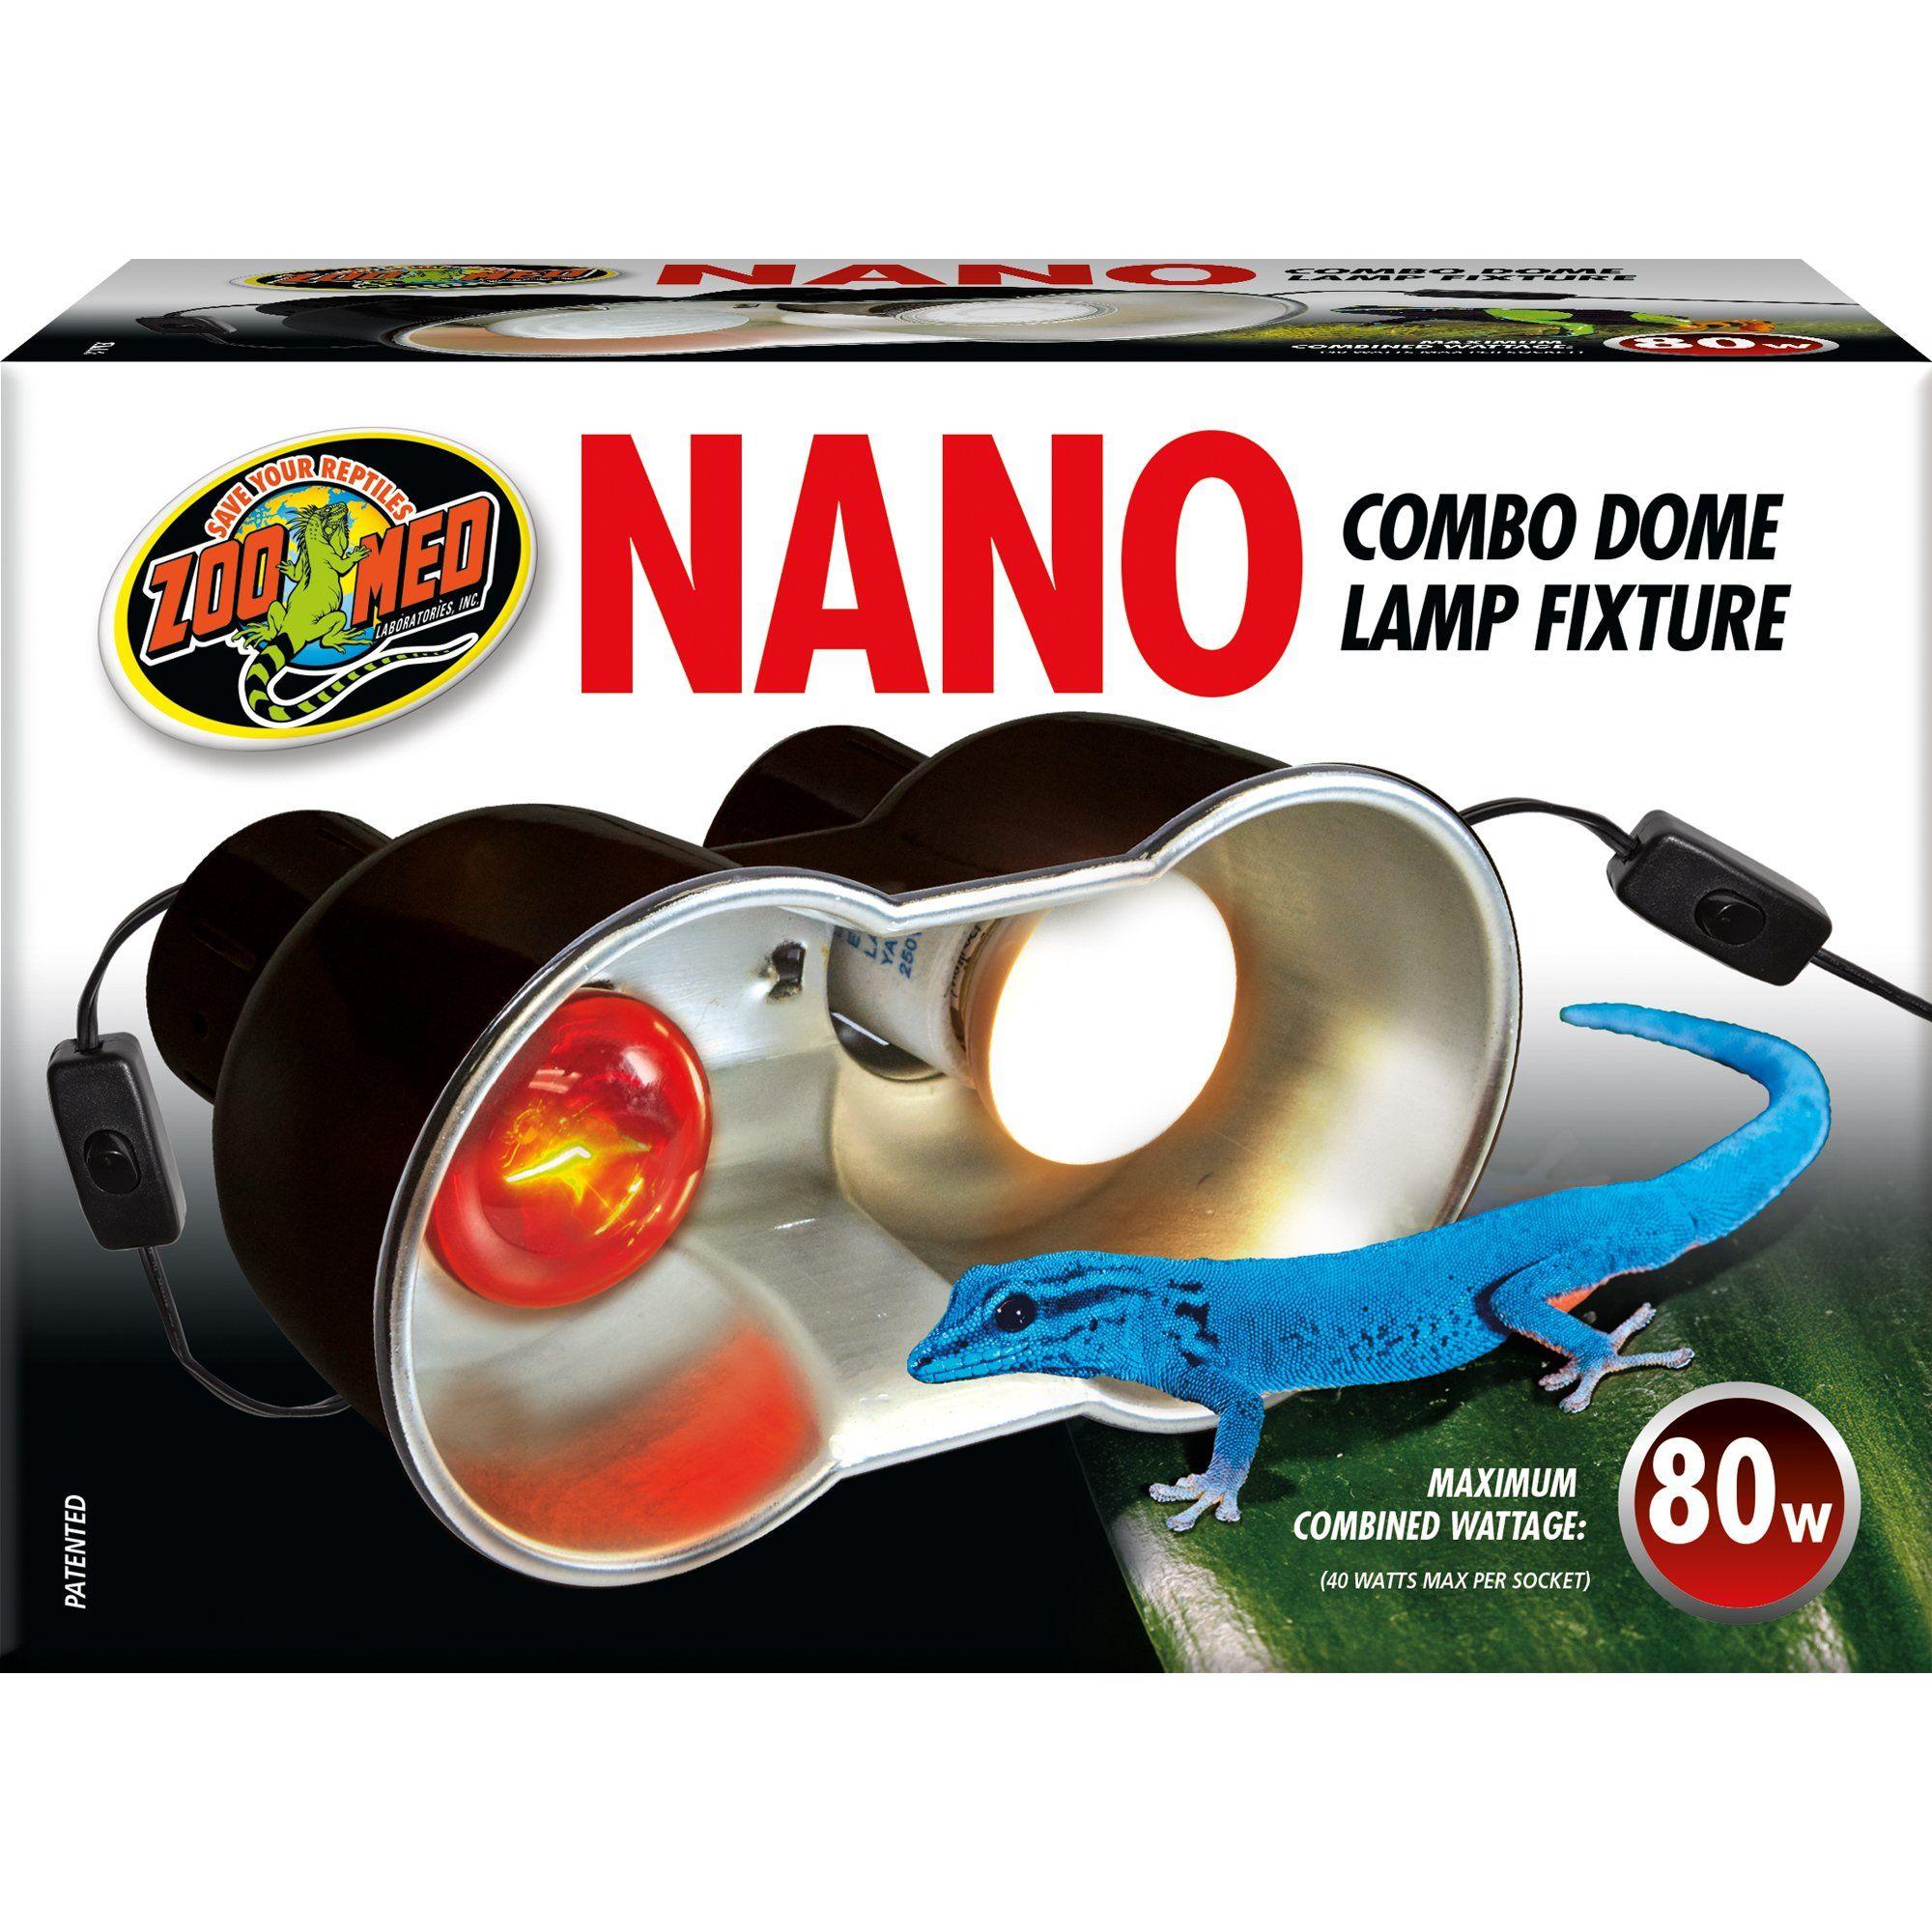 Zoo Med Nano Combo Dome Lamp Fixture 100 Watt Reptile Lights Reptile Supplies